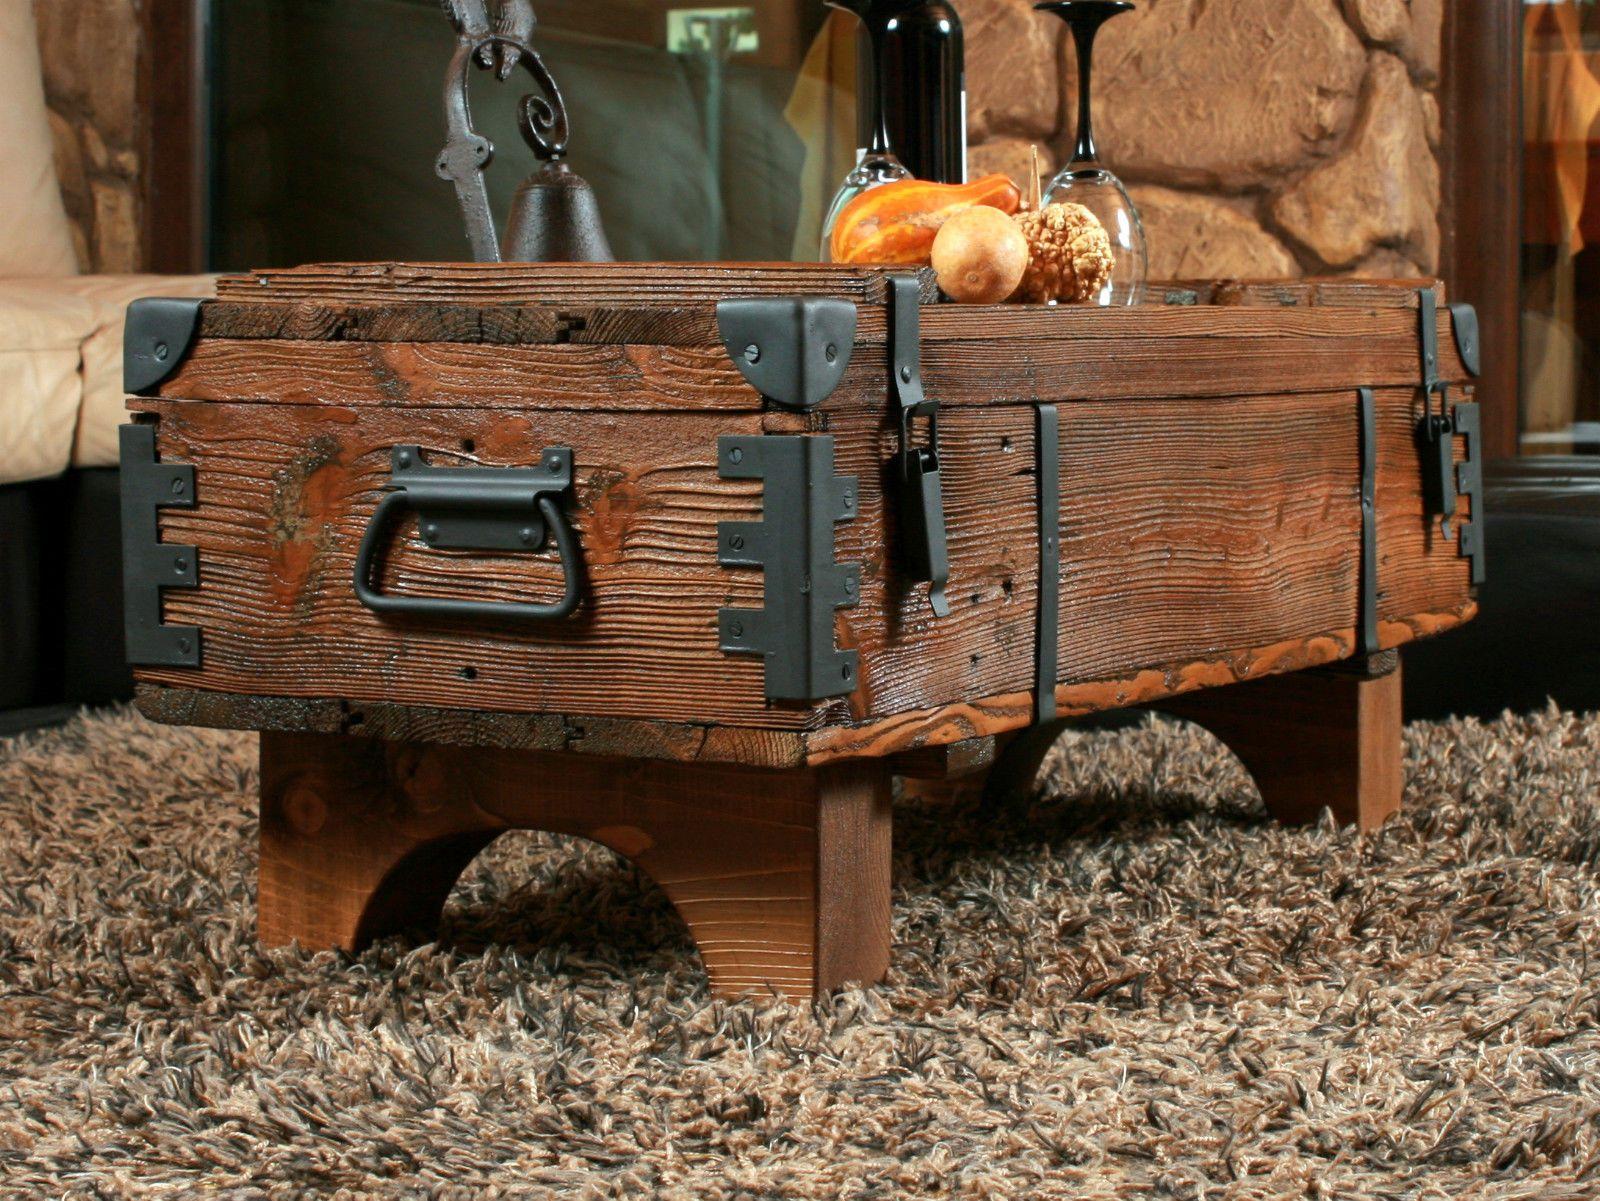 Alte Truhe Kiste Tisch Shabby Chic Holz Beistelltisch Holztruhe Couchtisch 16 Eur 184 99 Massive Holztruhe In Schabby Alte Truhe Holztruhe Couchtisch Truhe